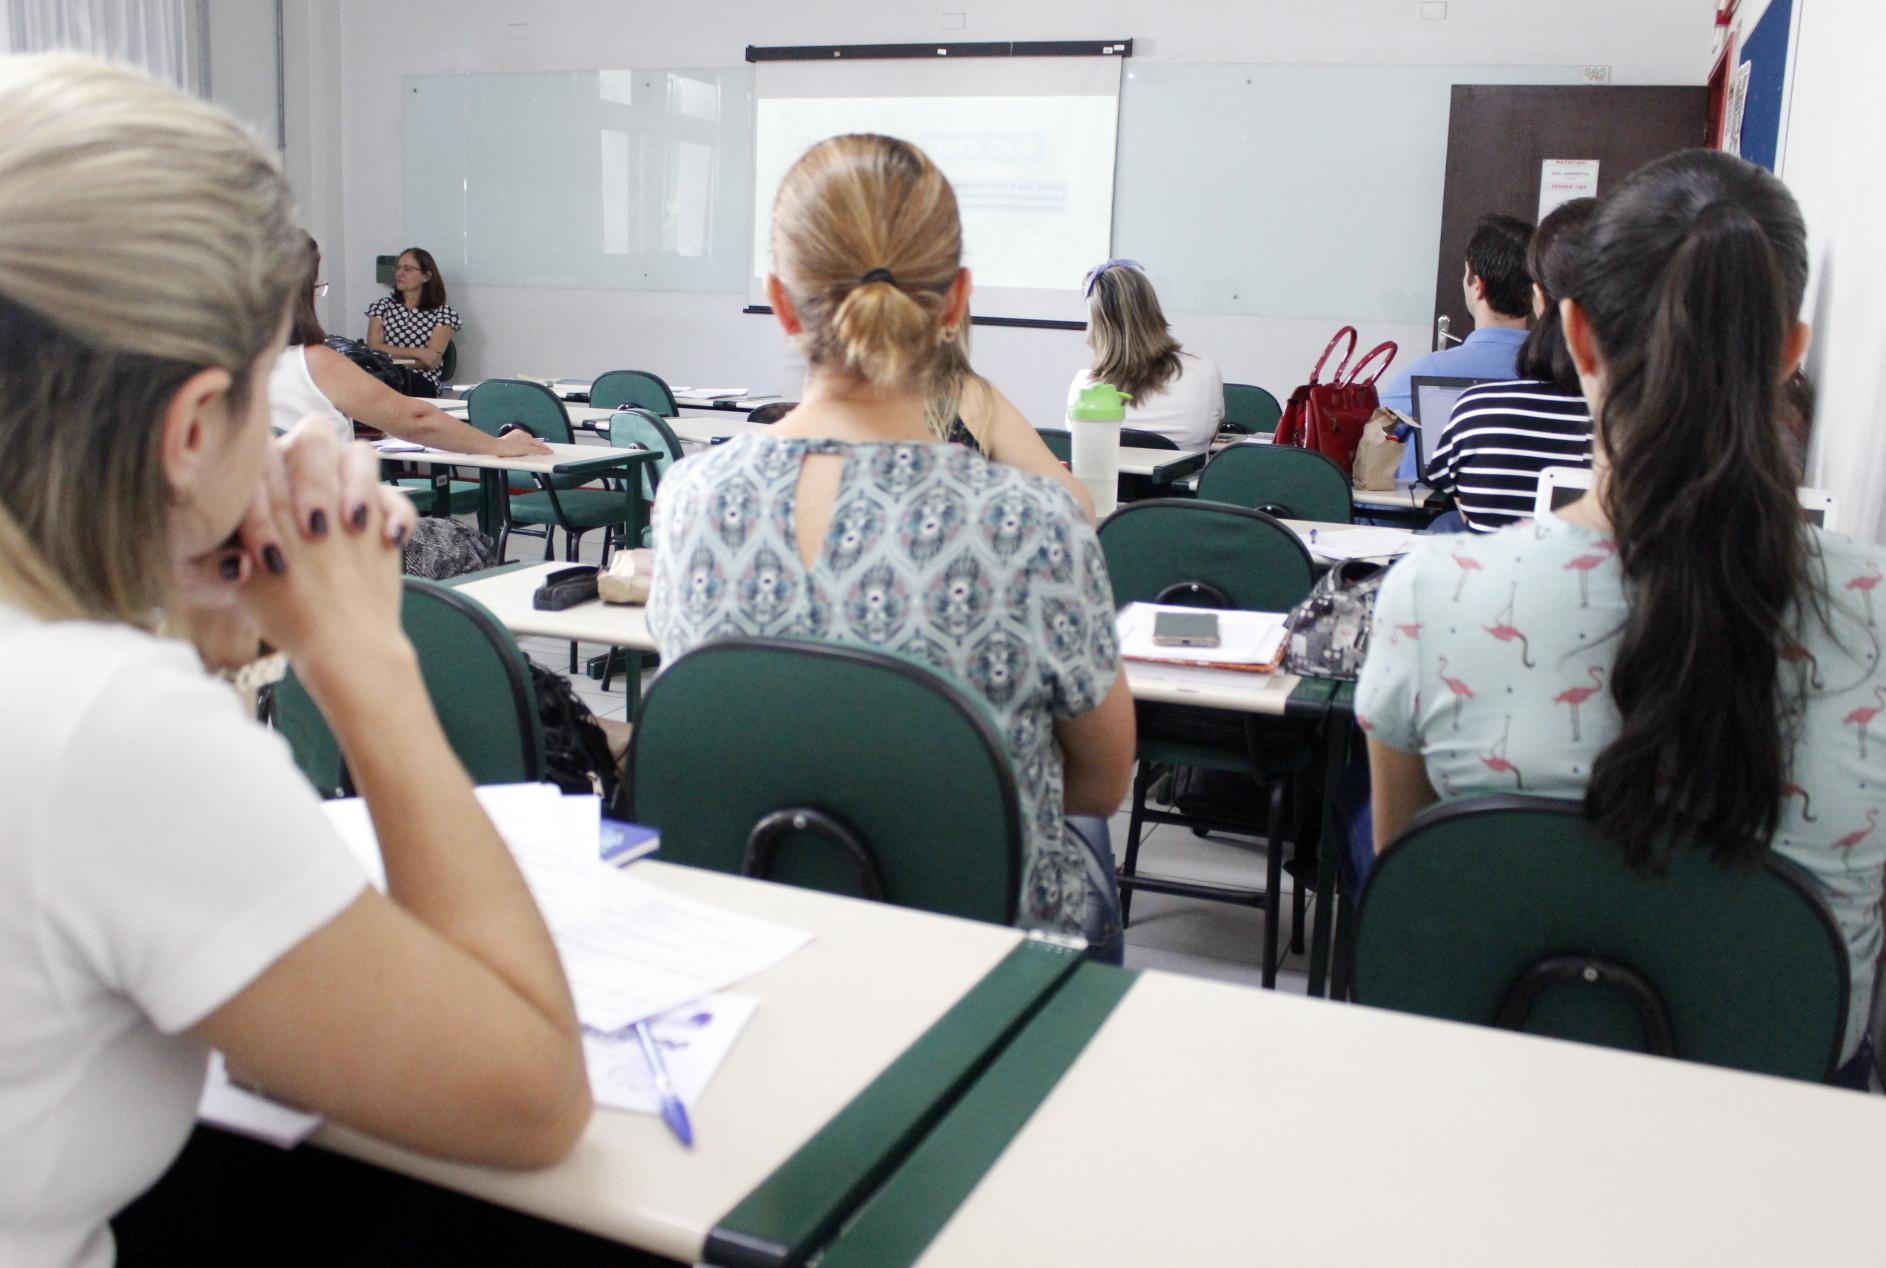 Prefeitura Municipal de Criciúma - Educadores discutem currículo escolar da rede municipal de Criciúma